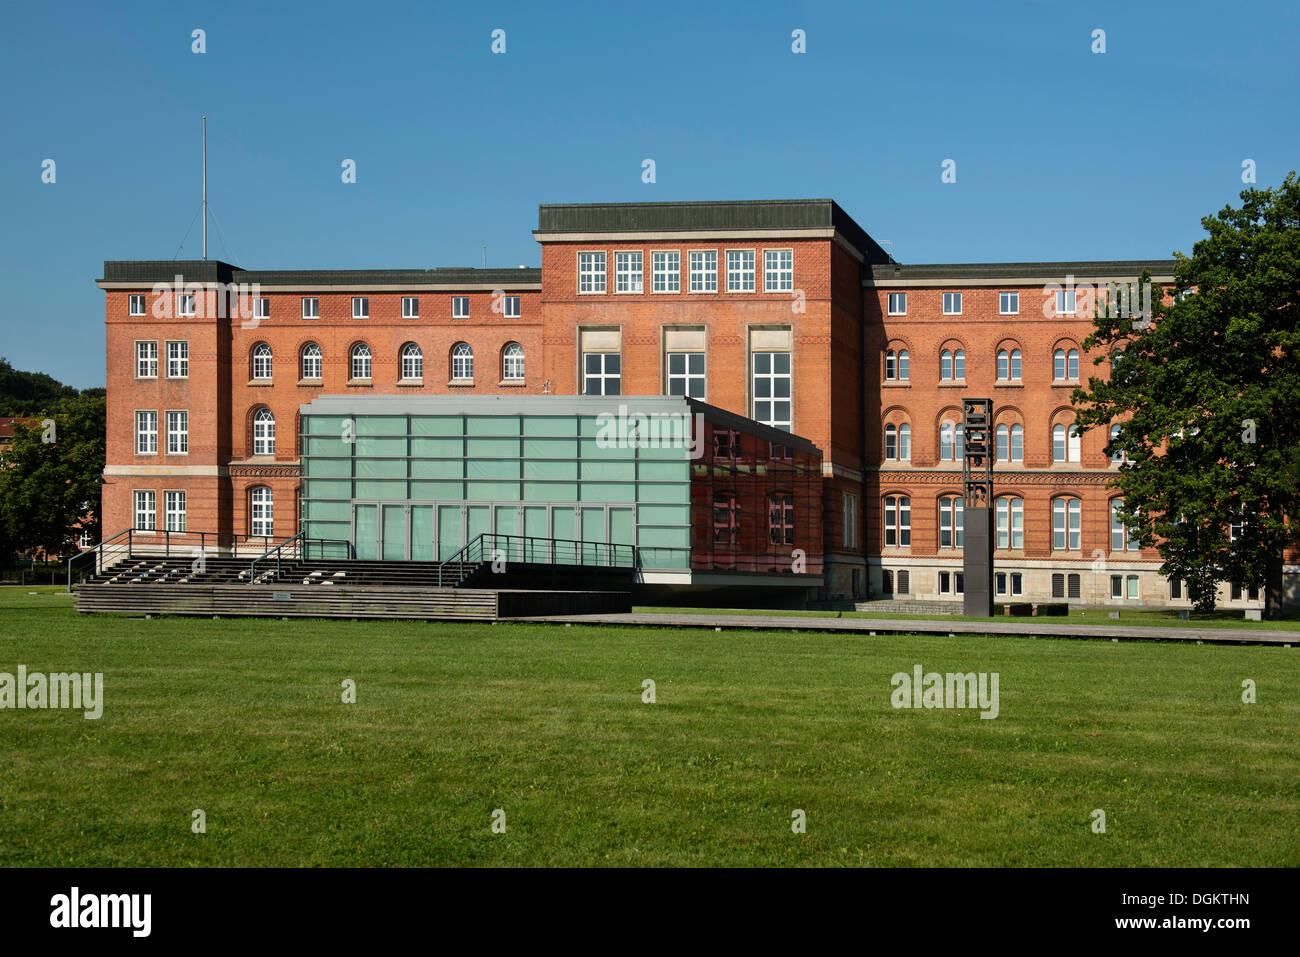 Landeshaus Kiel, Schleswig-Holstein state parliament building, Kiel, Schleswig-Holstein, PublicGround - Stock Image